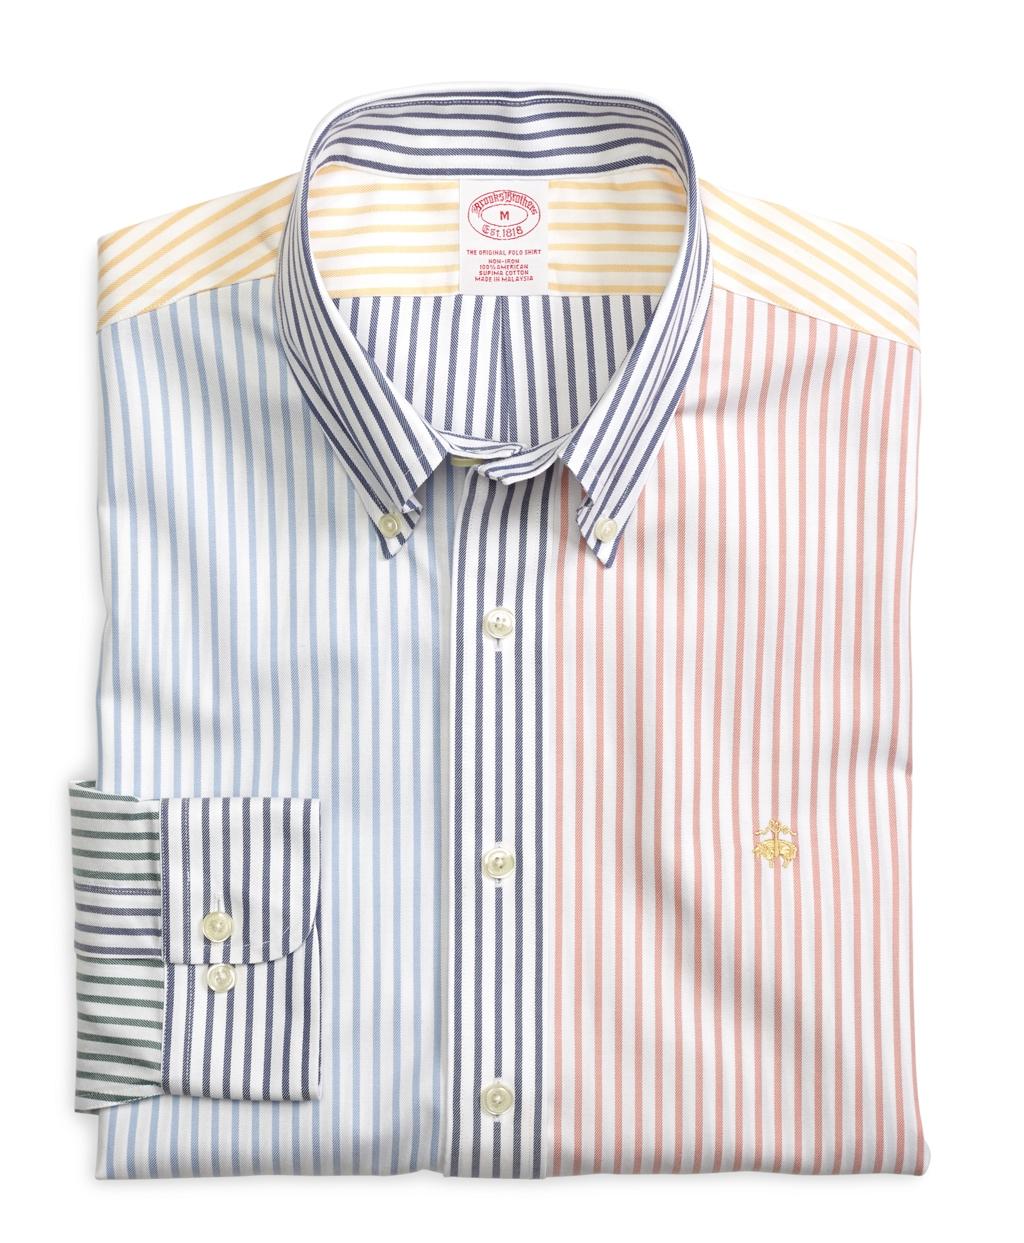 Brooks brothers non iron slim fit multi stripe sport shirt for Brooks brothers non iron shirts review